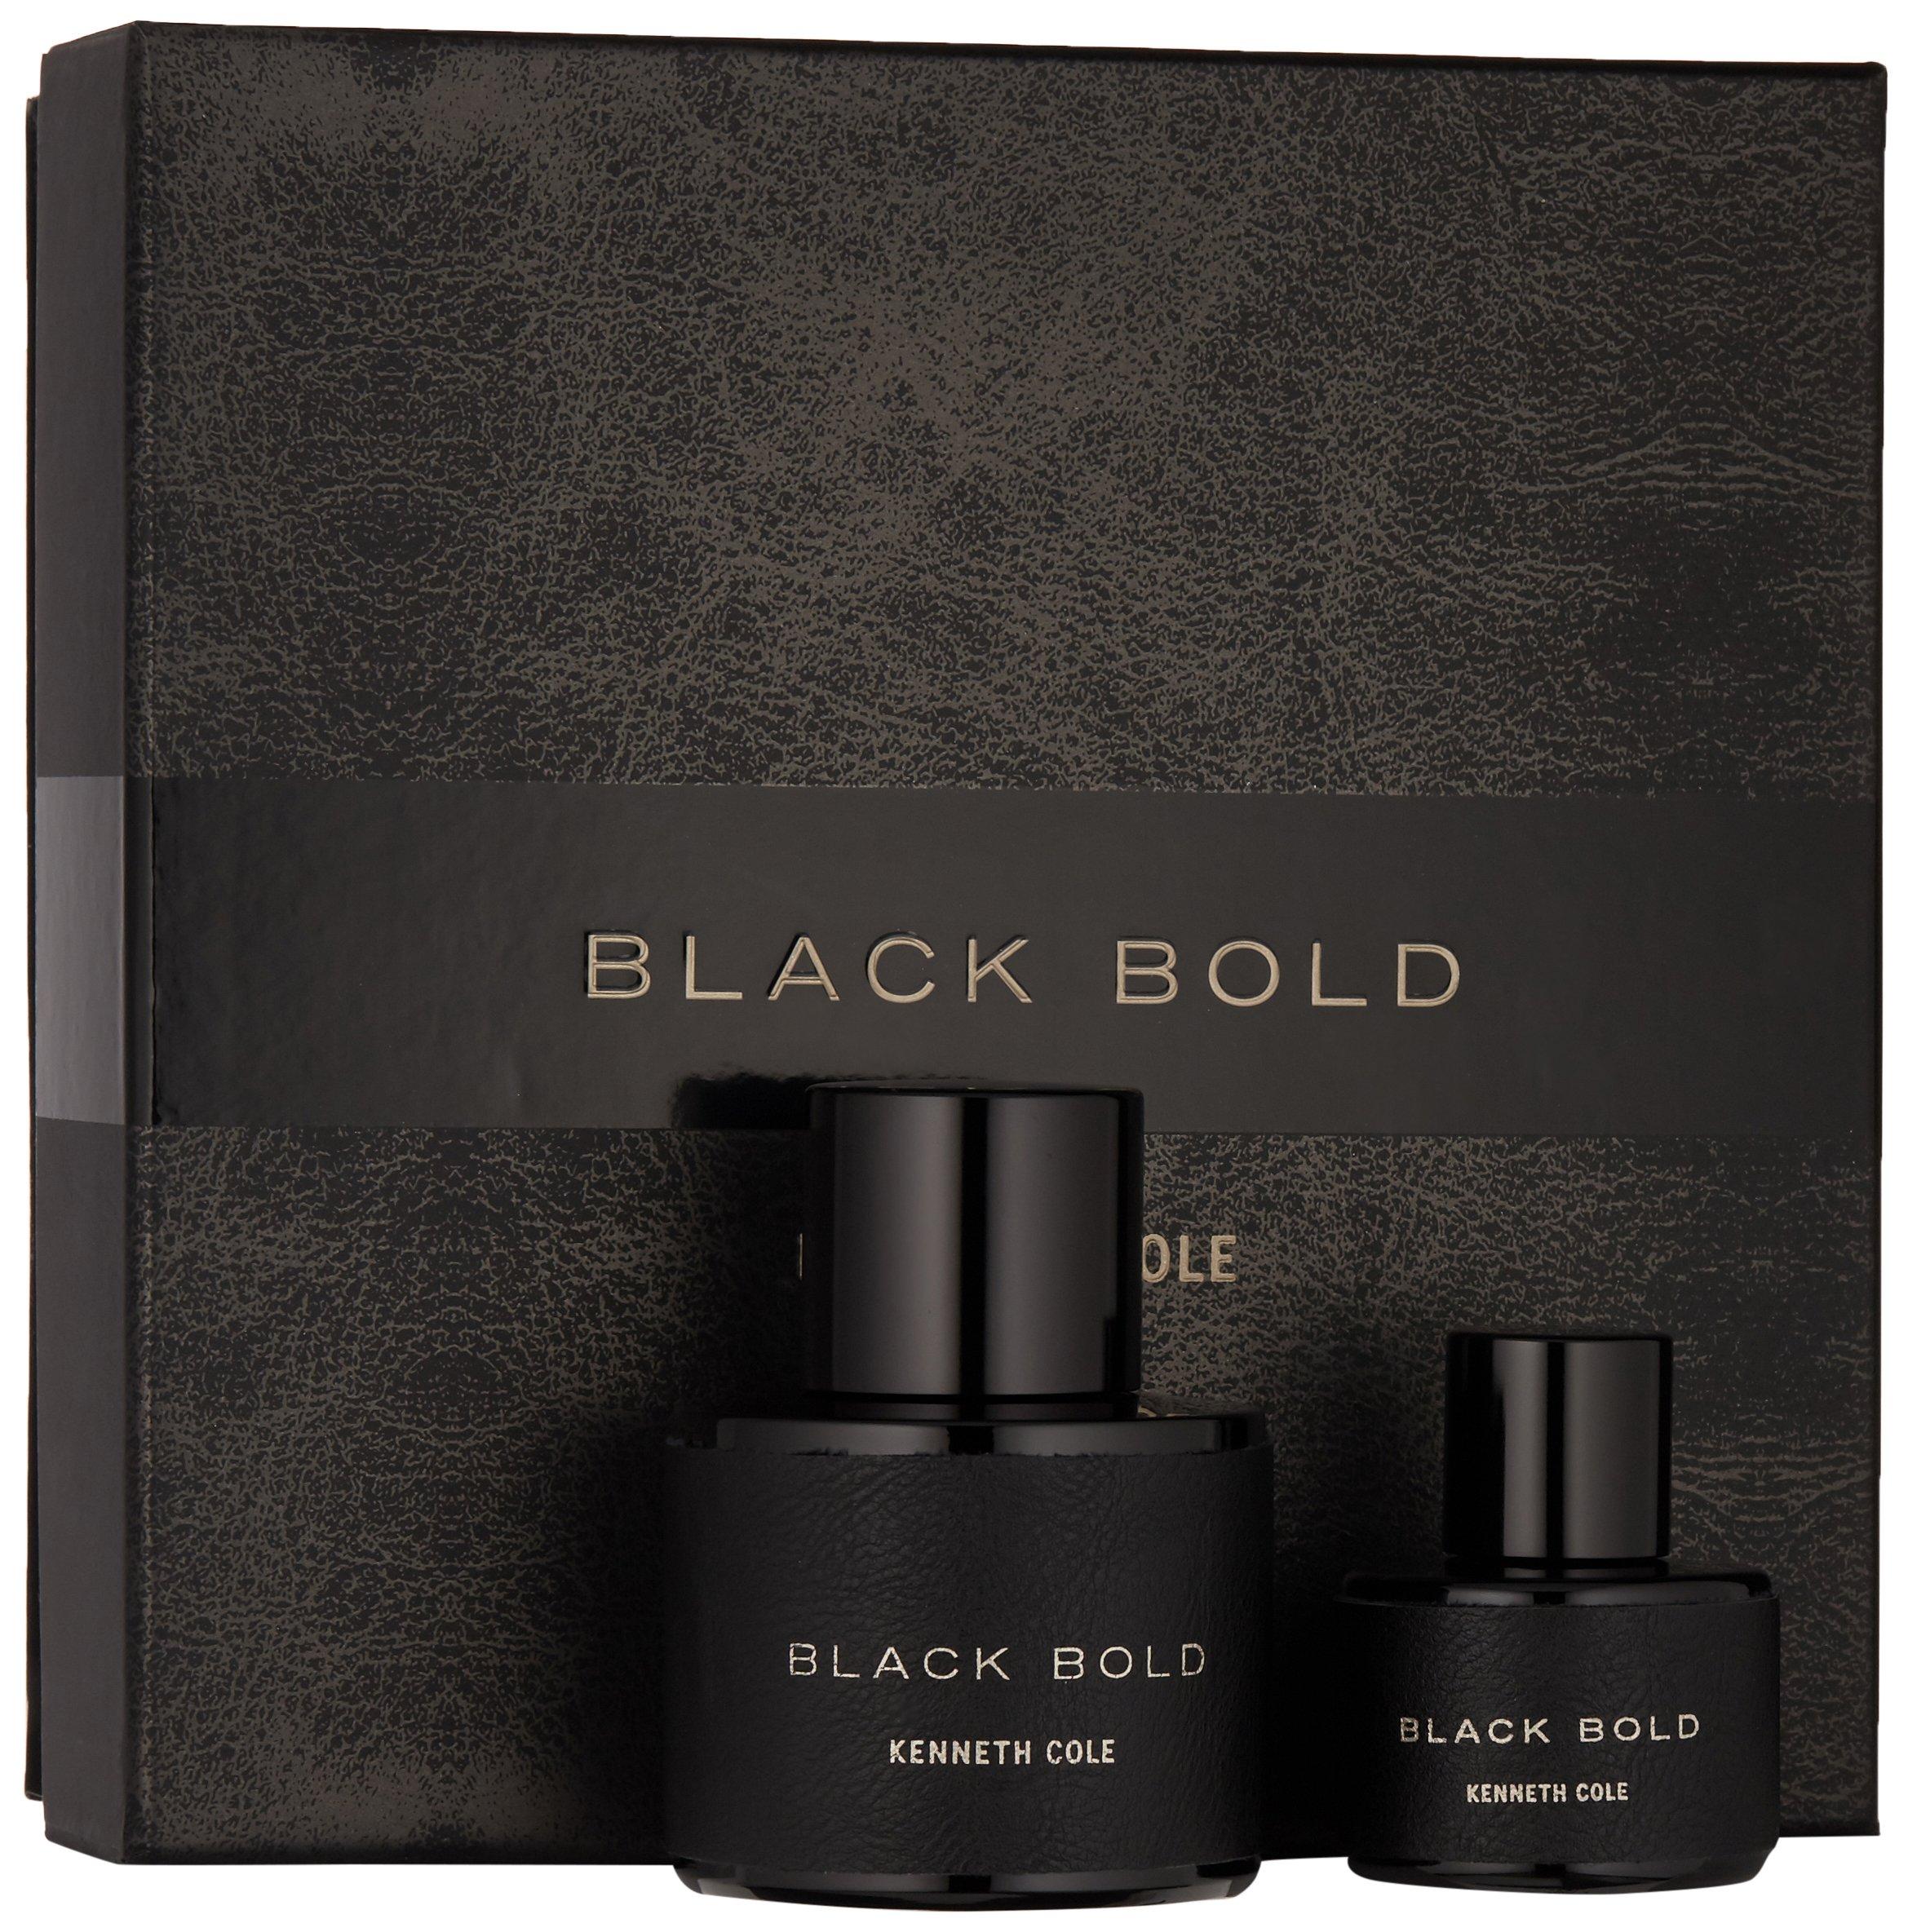 Kenneth Cole Black Bold 2 Piece Gift Set